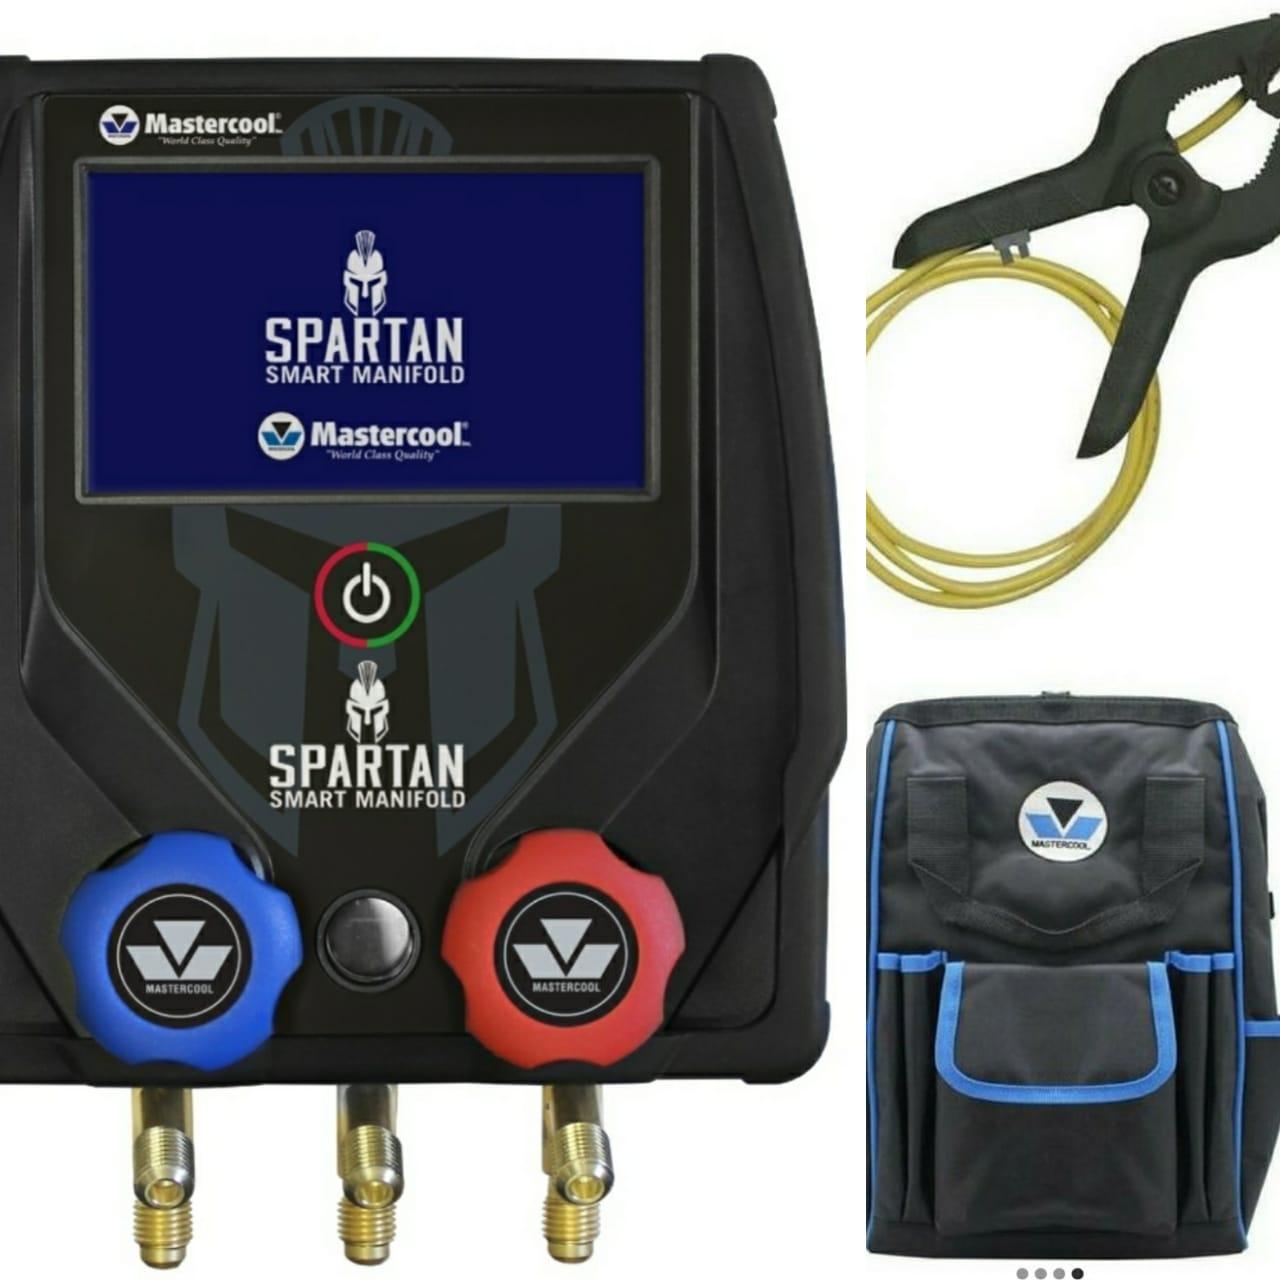 Kit Manifold Digital Spartan 2 vias Sensor Mochila MASTERCOOL